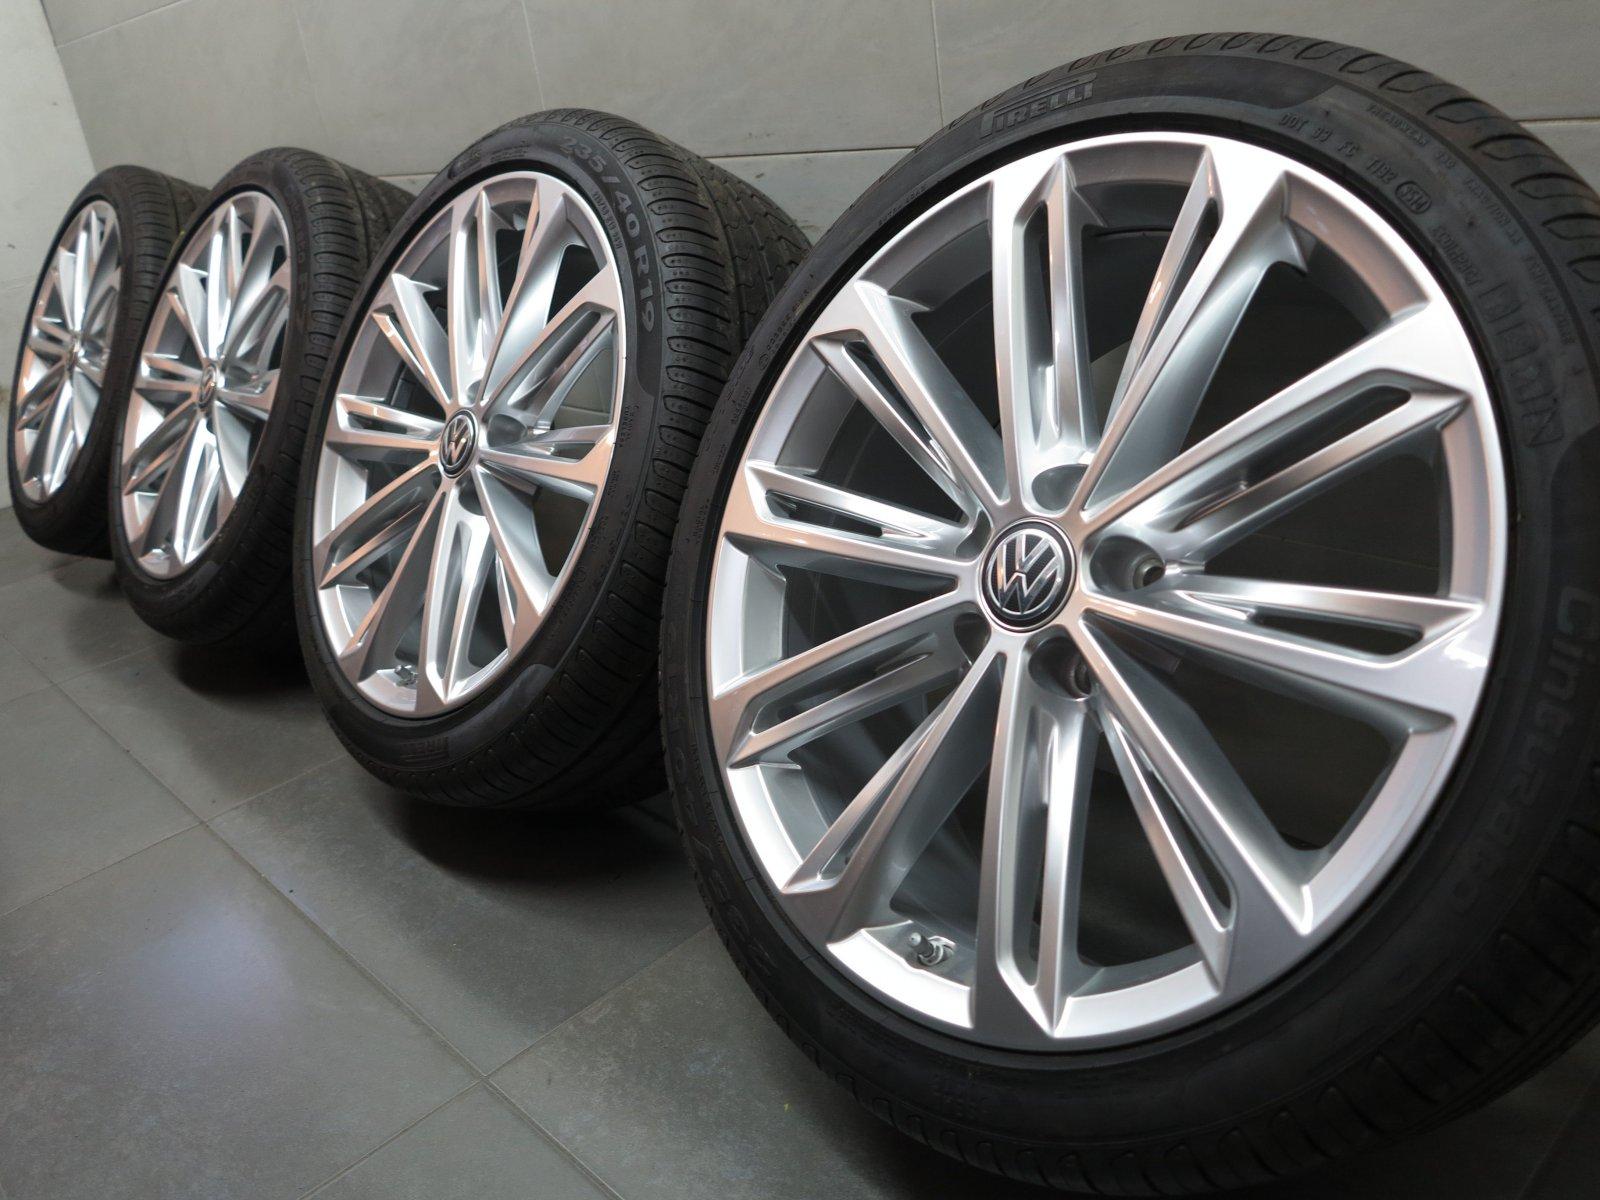 19 Inch Summer Wheels Original Vw Passat 3g B8 Verona Rims